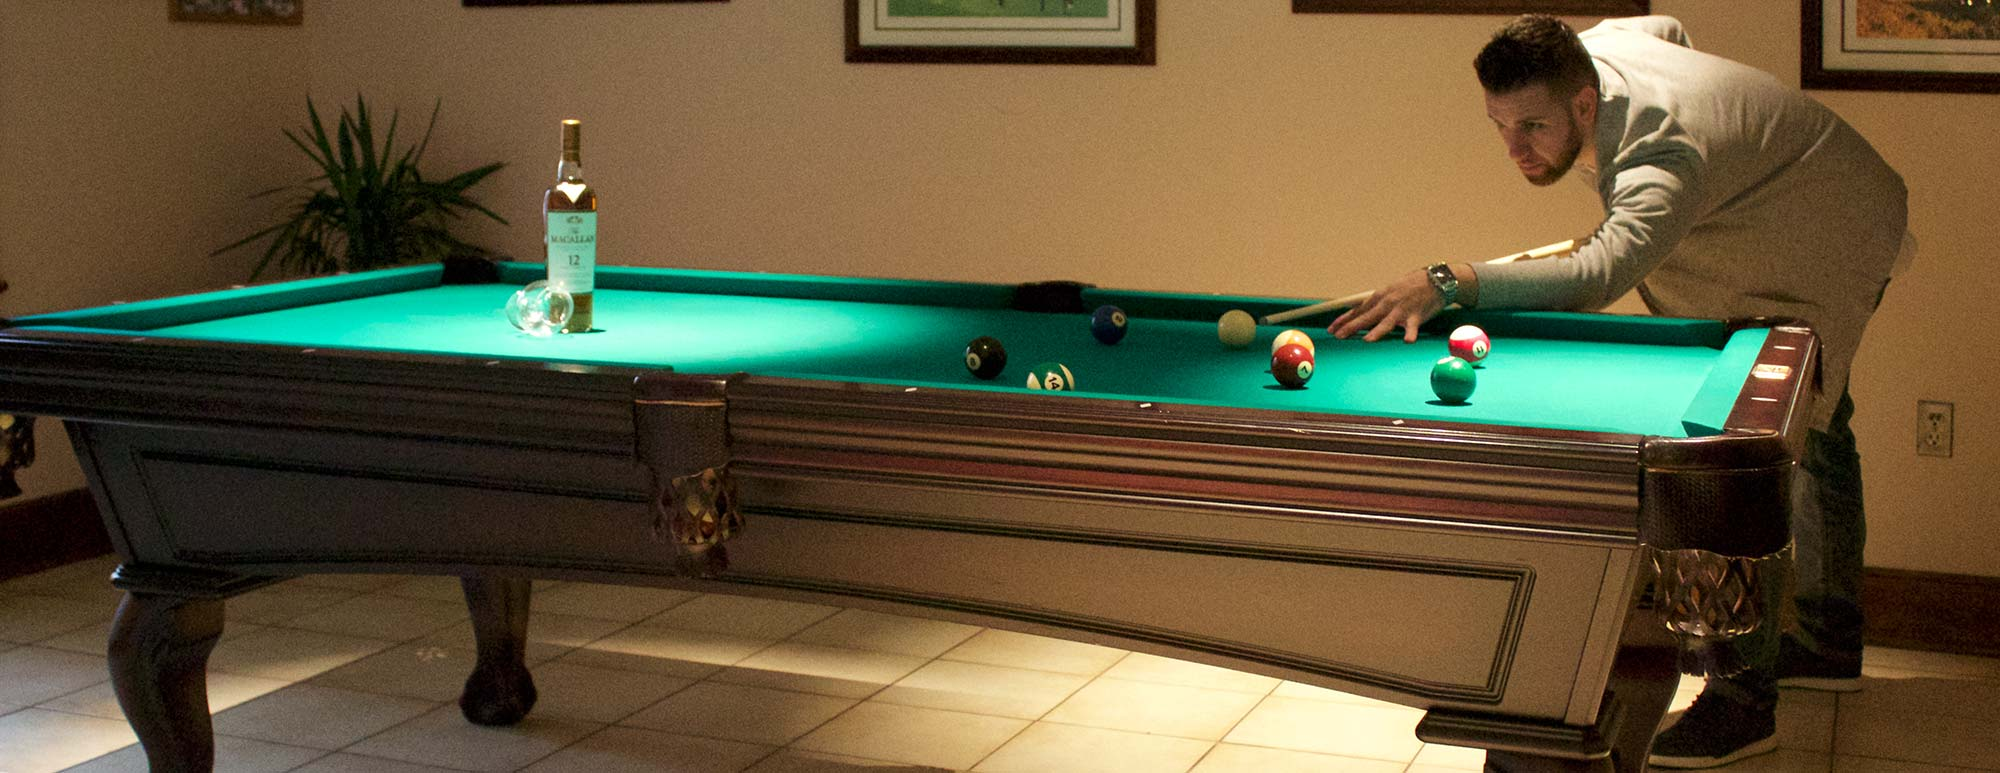 Princeton ItalianAmerican Sportsmens Club Affortable Rental For - Princeton pool table